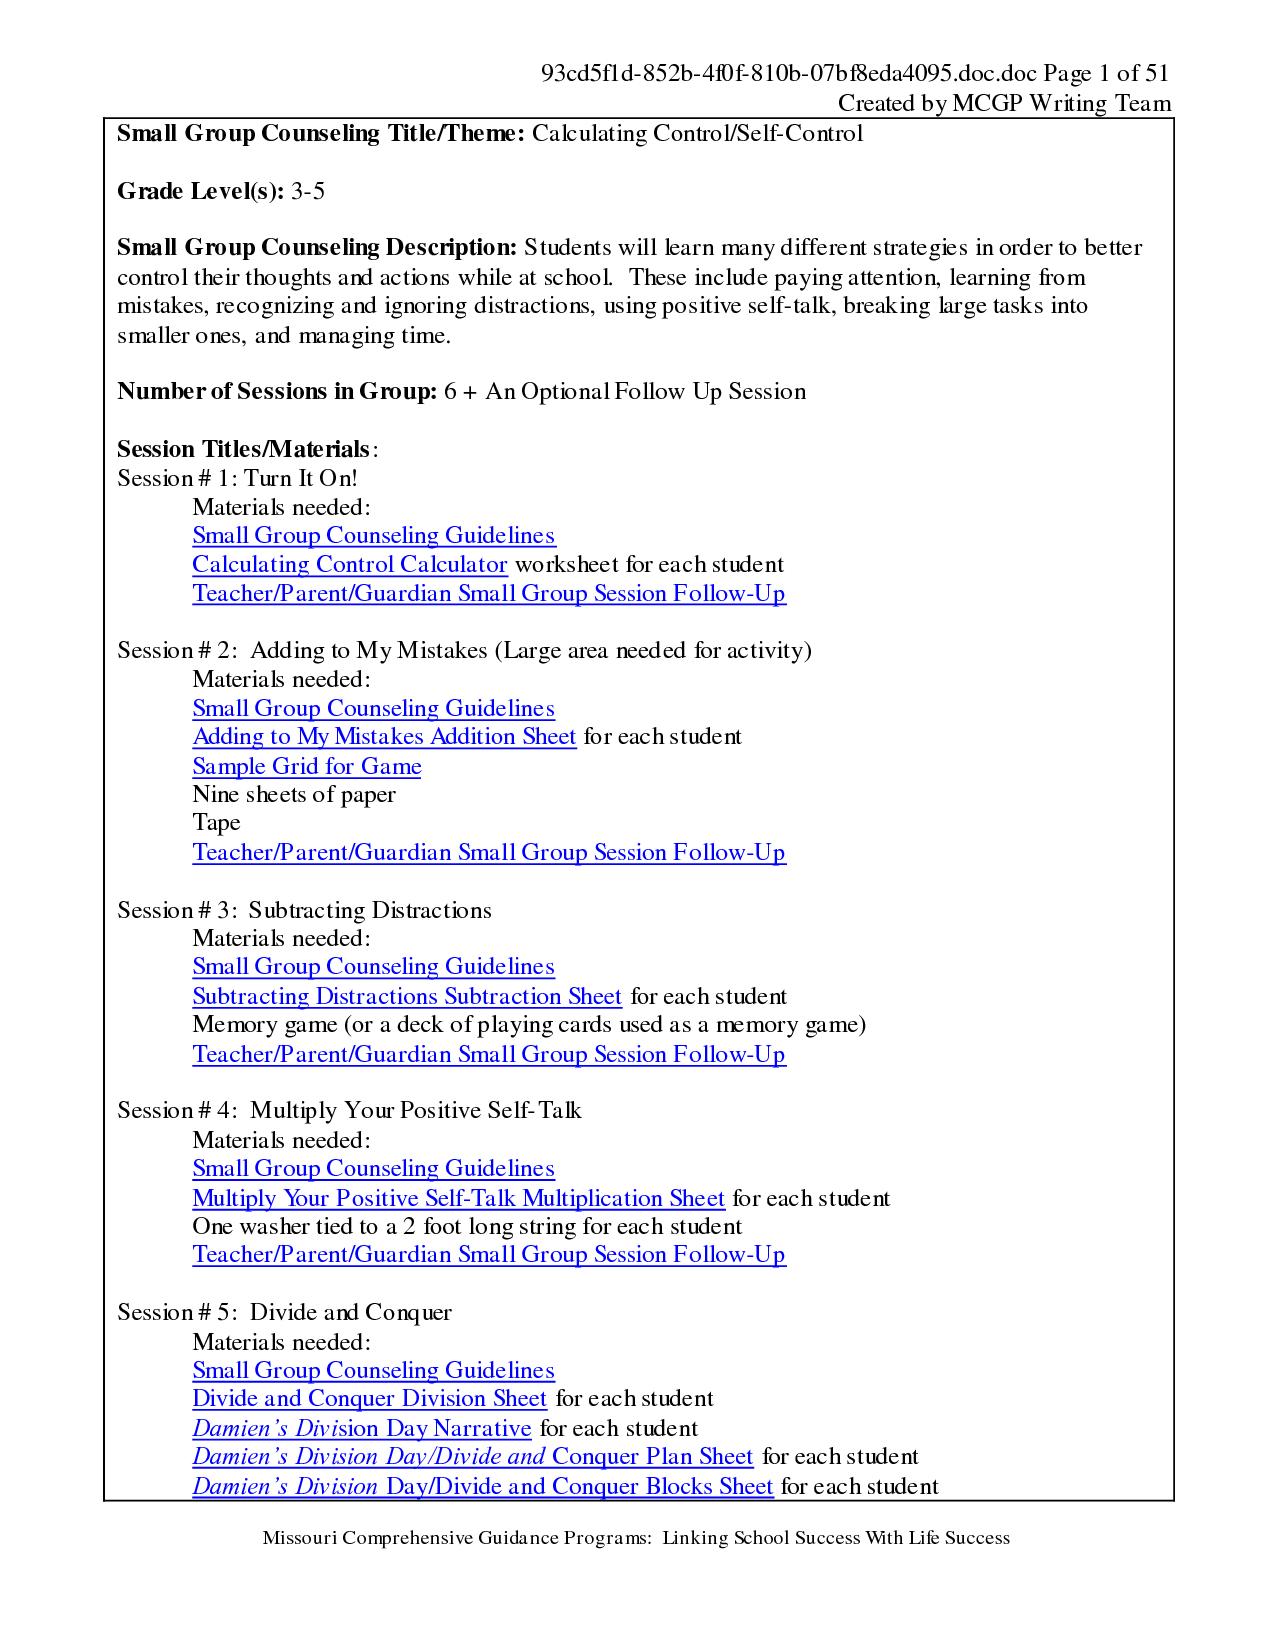 Negative Self Talk Worksheet | ABITLIKETHIS